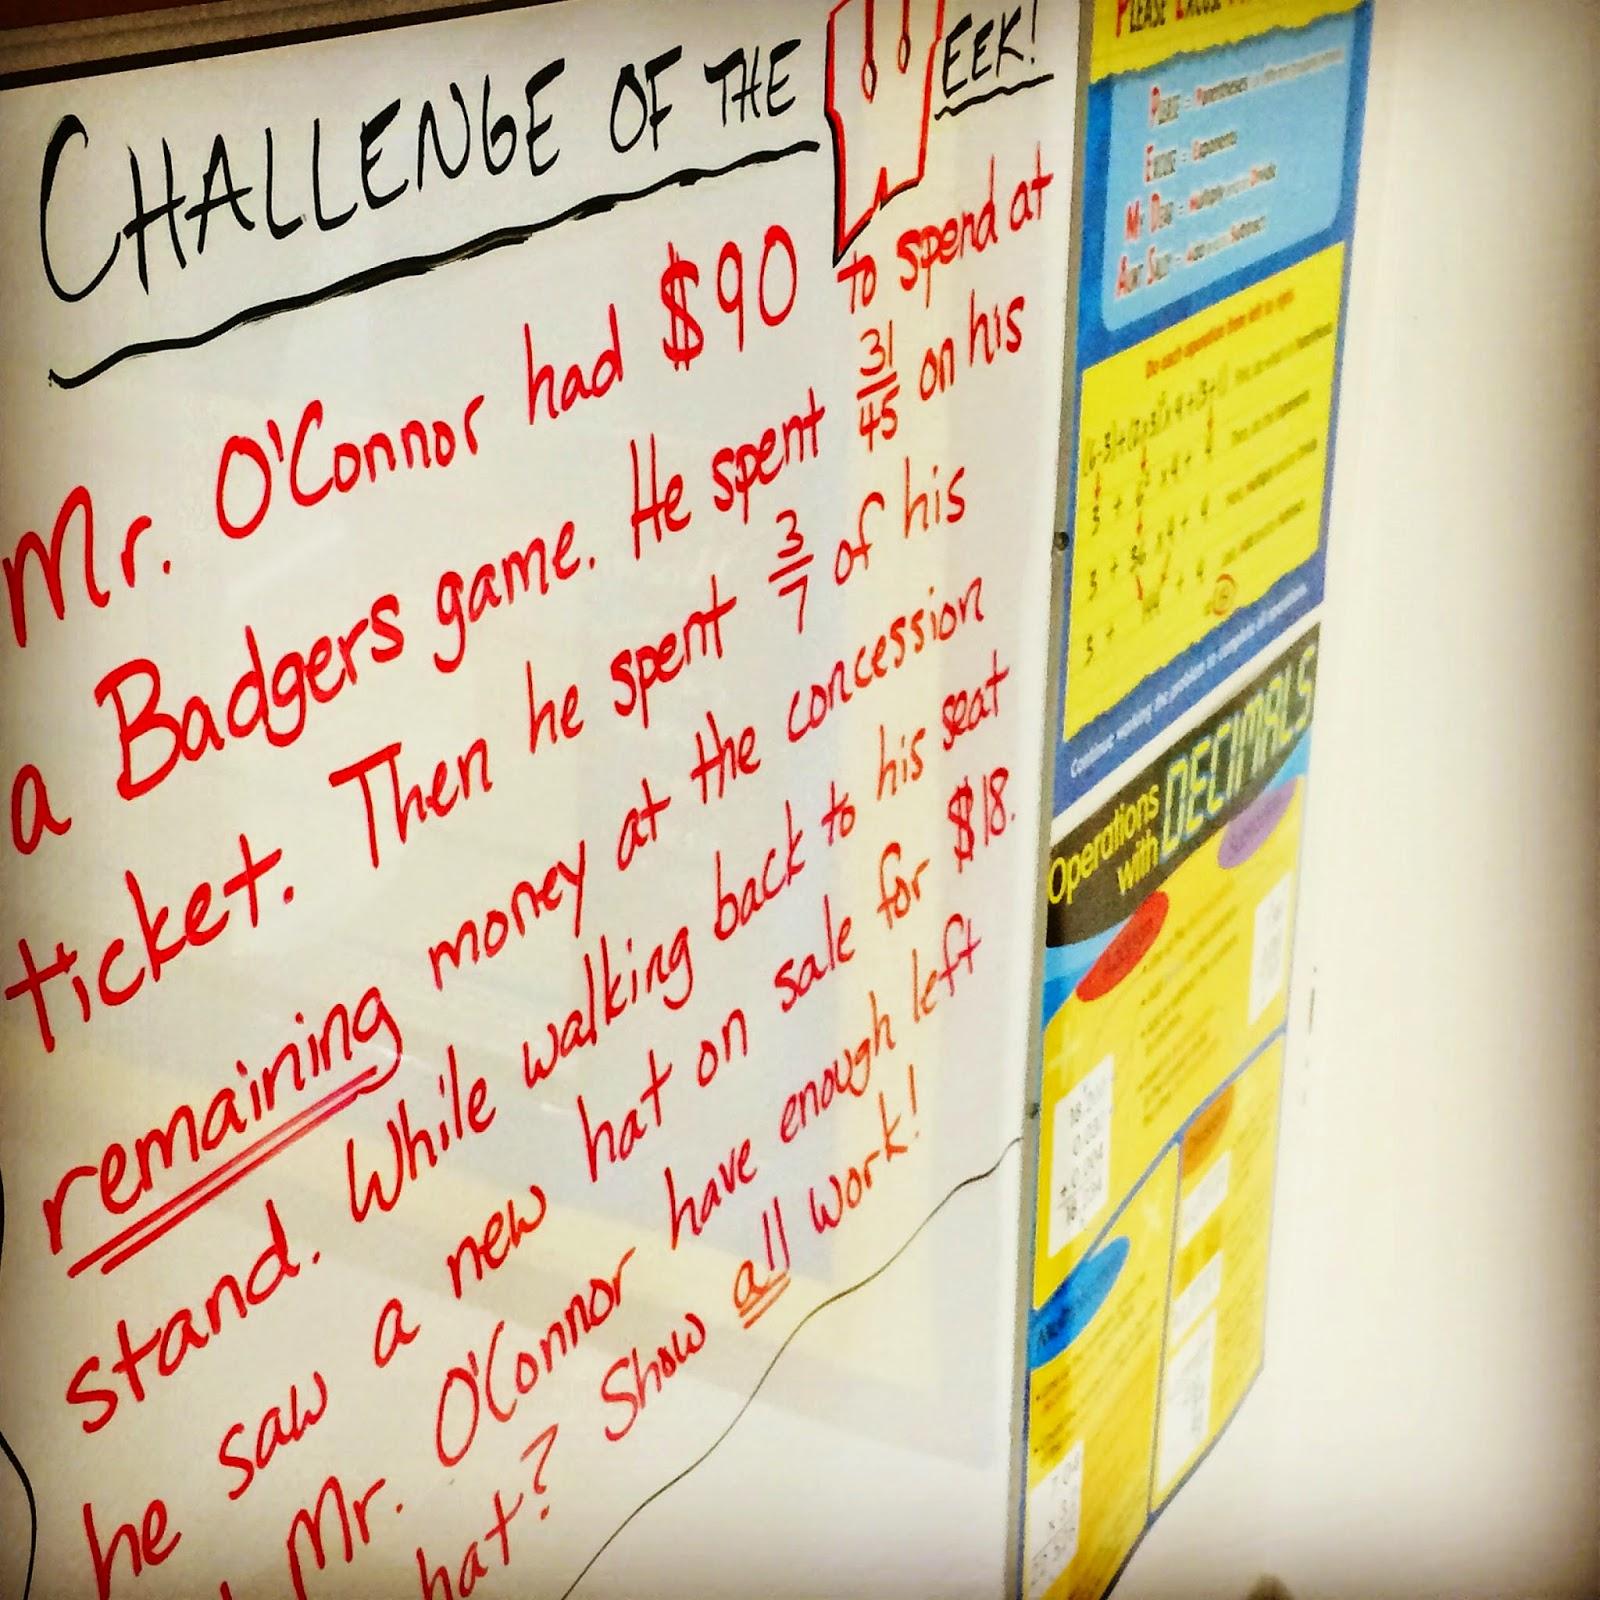 Challenge Math Worksheets For 6th Grade challenge math worksheets for 5th  grade christmas [ 1600 x 1600 Pixel ]